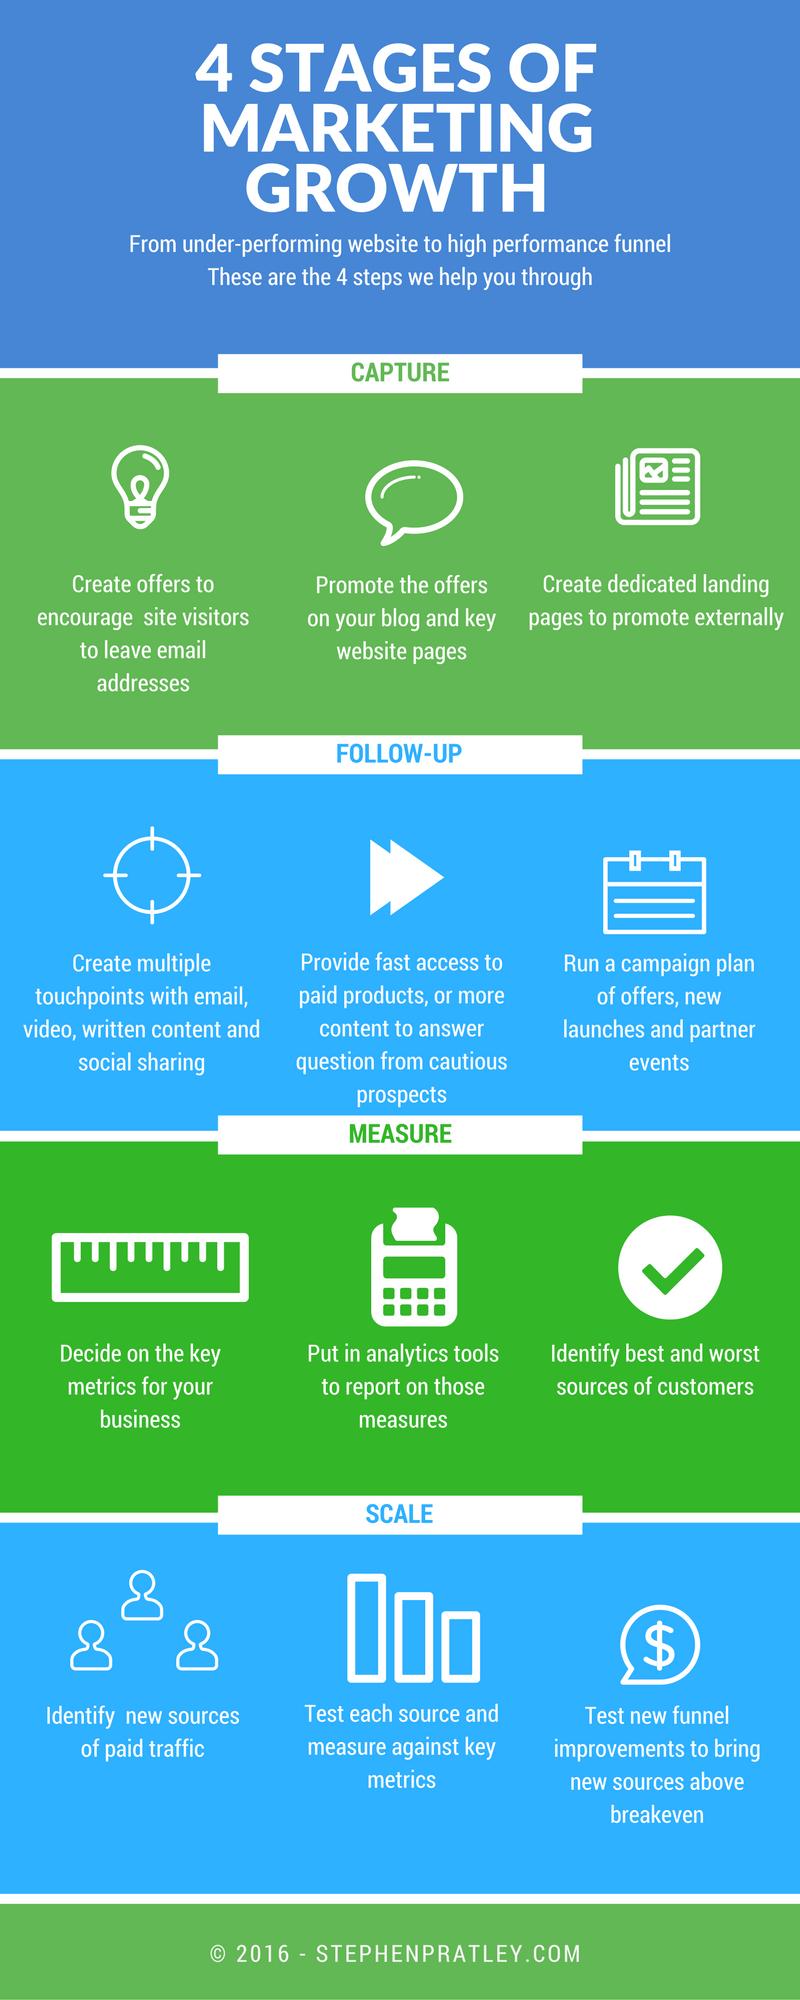 stephenpratley-com_4_marketing_automation_stages